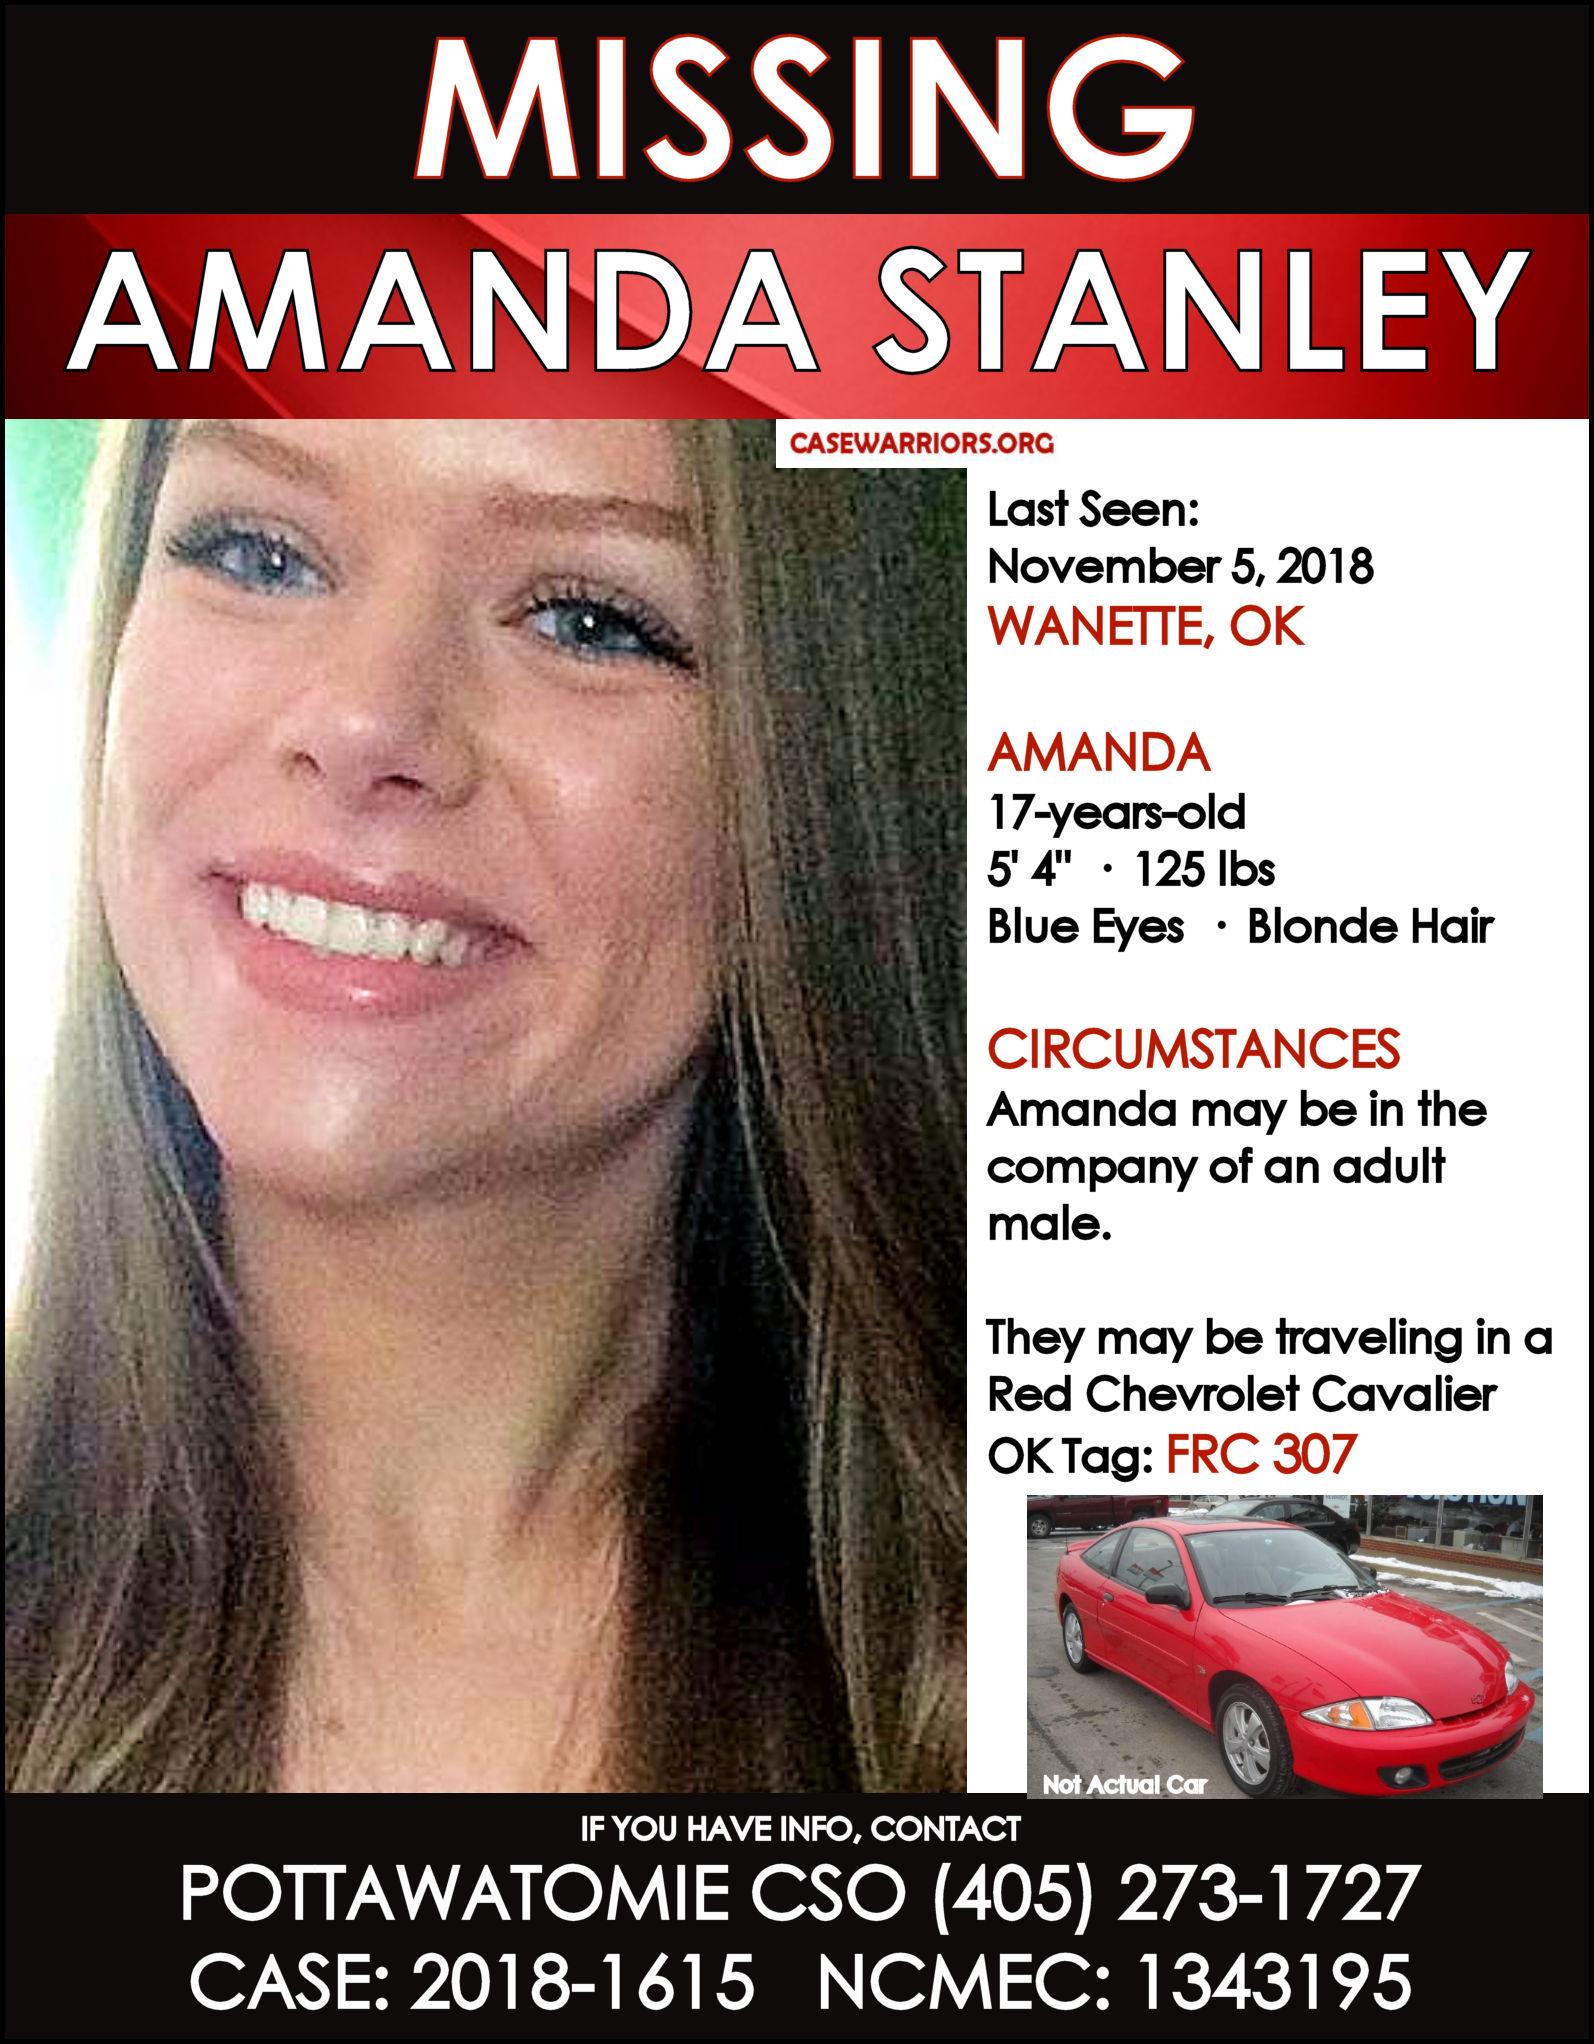 AMANDA STANLEY